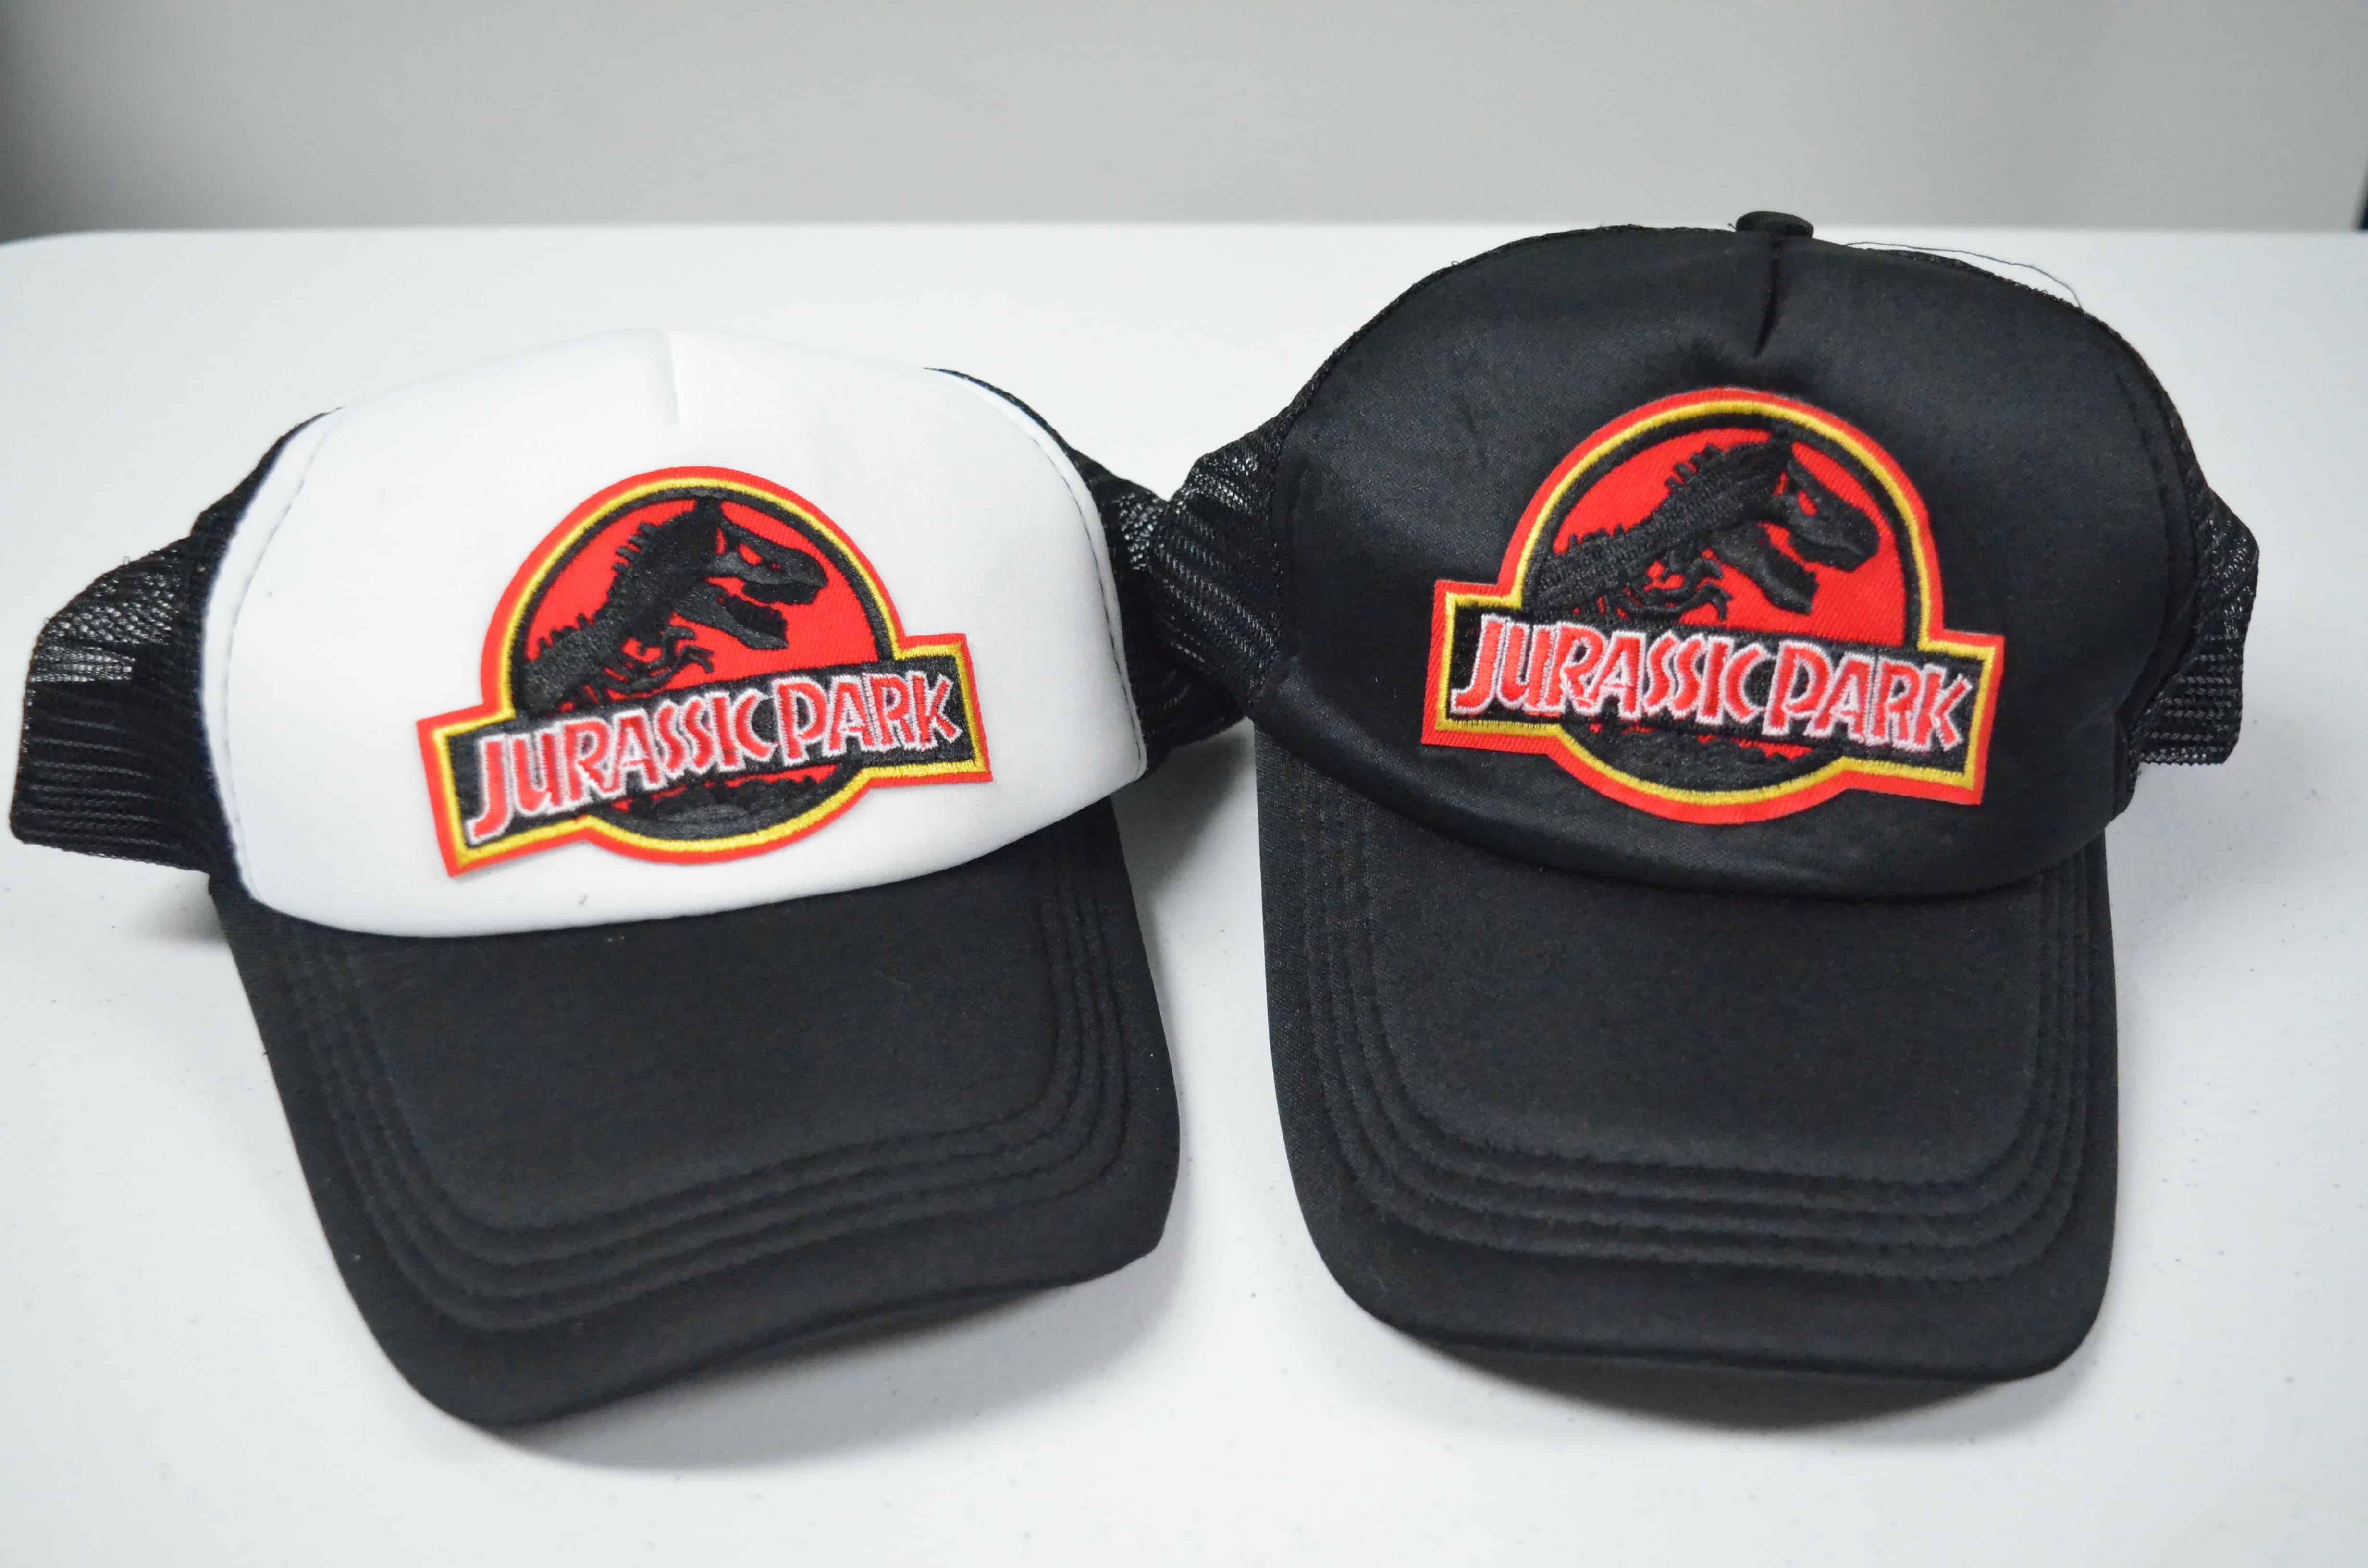 Jurassic Park hats